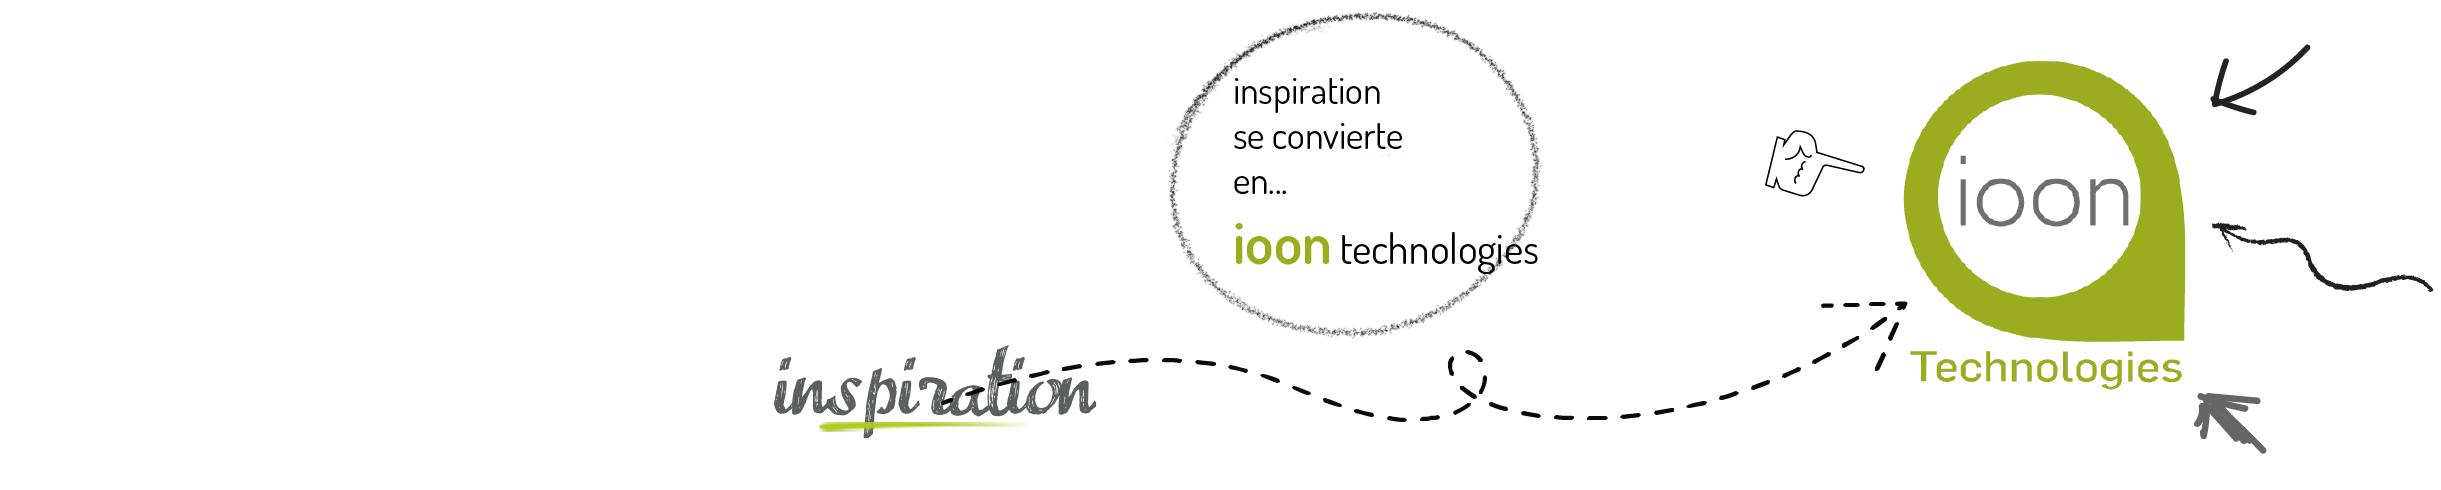 Borja Echevarria | Inspiration Ioon Technologies